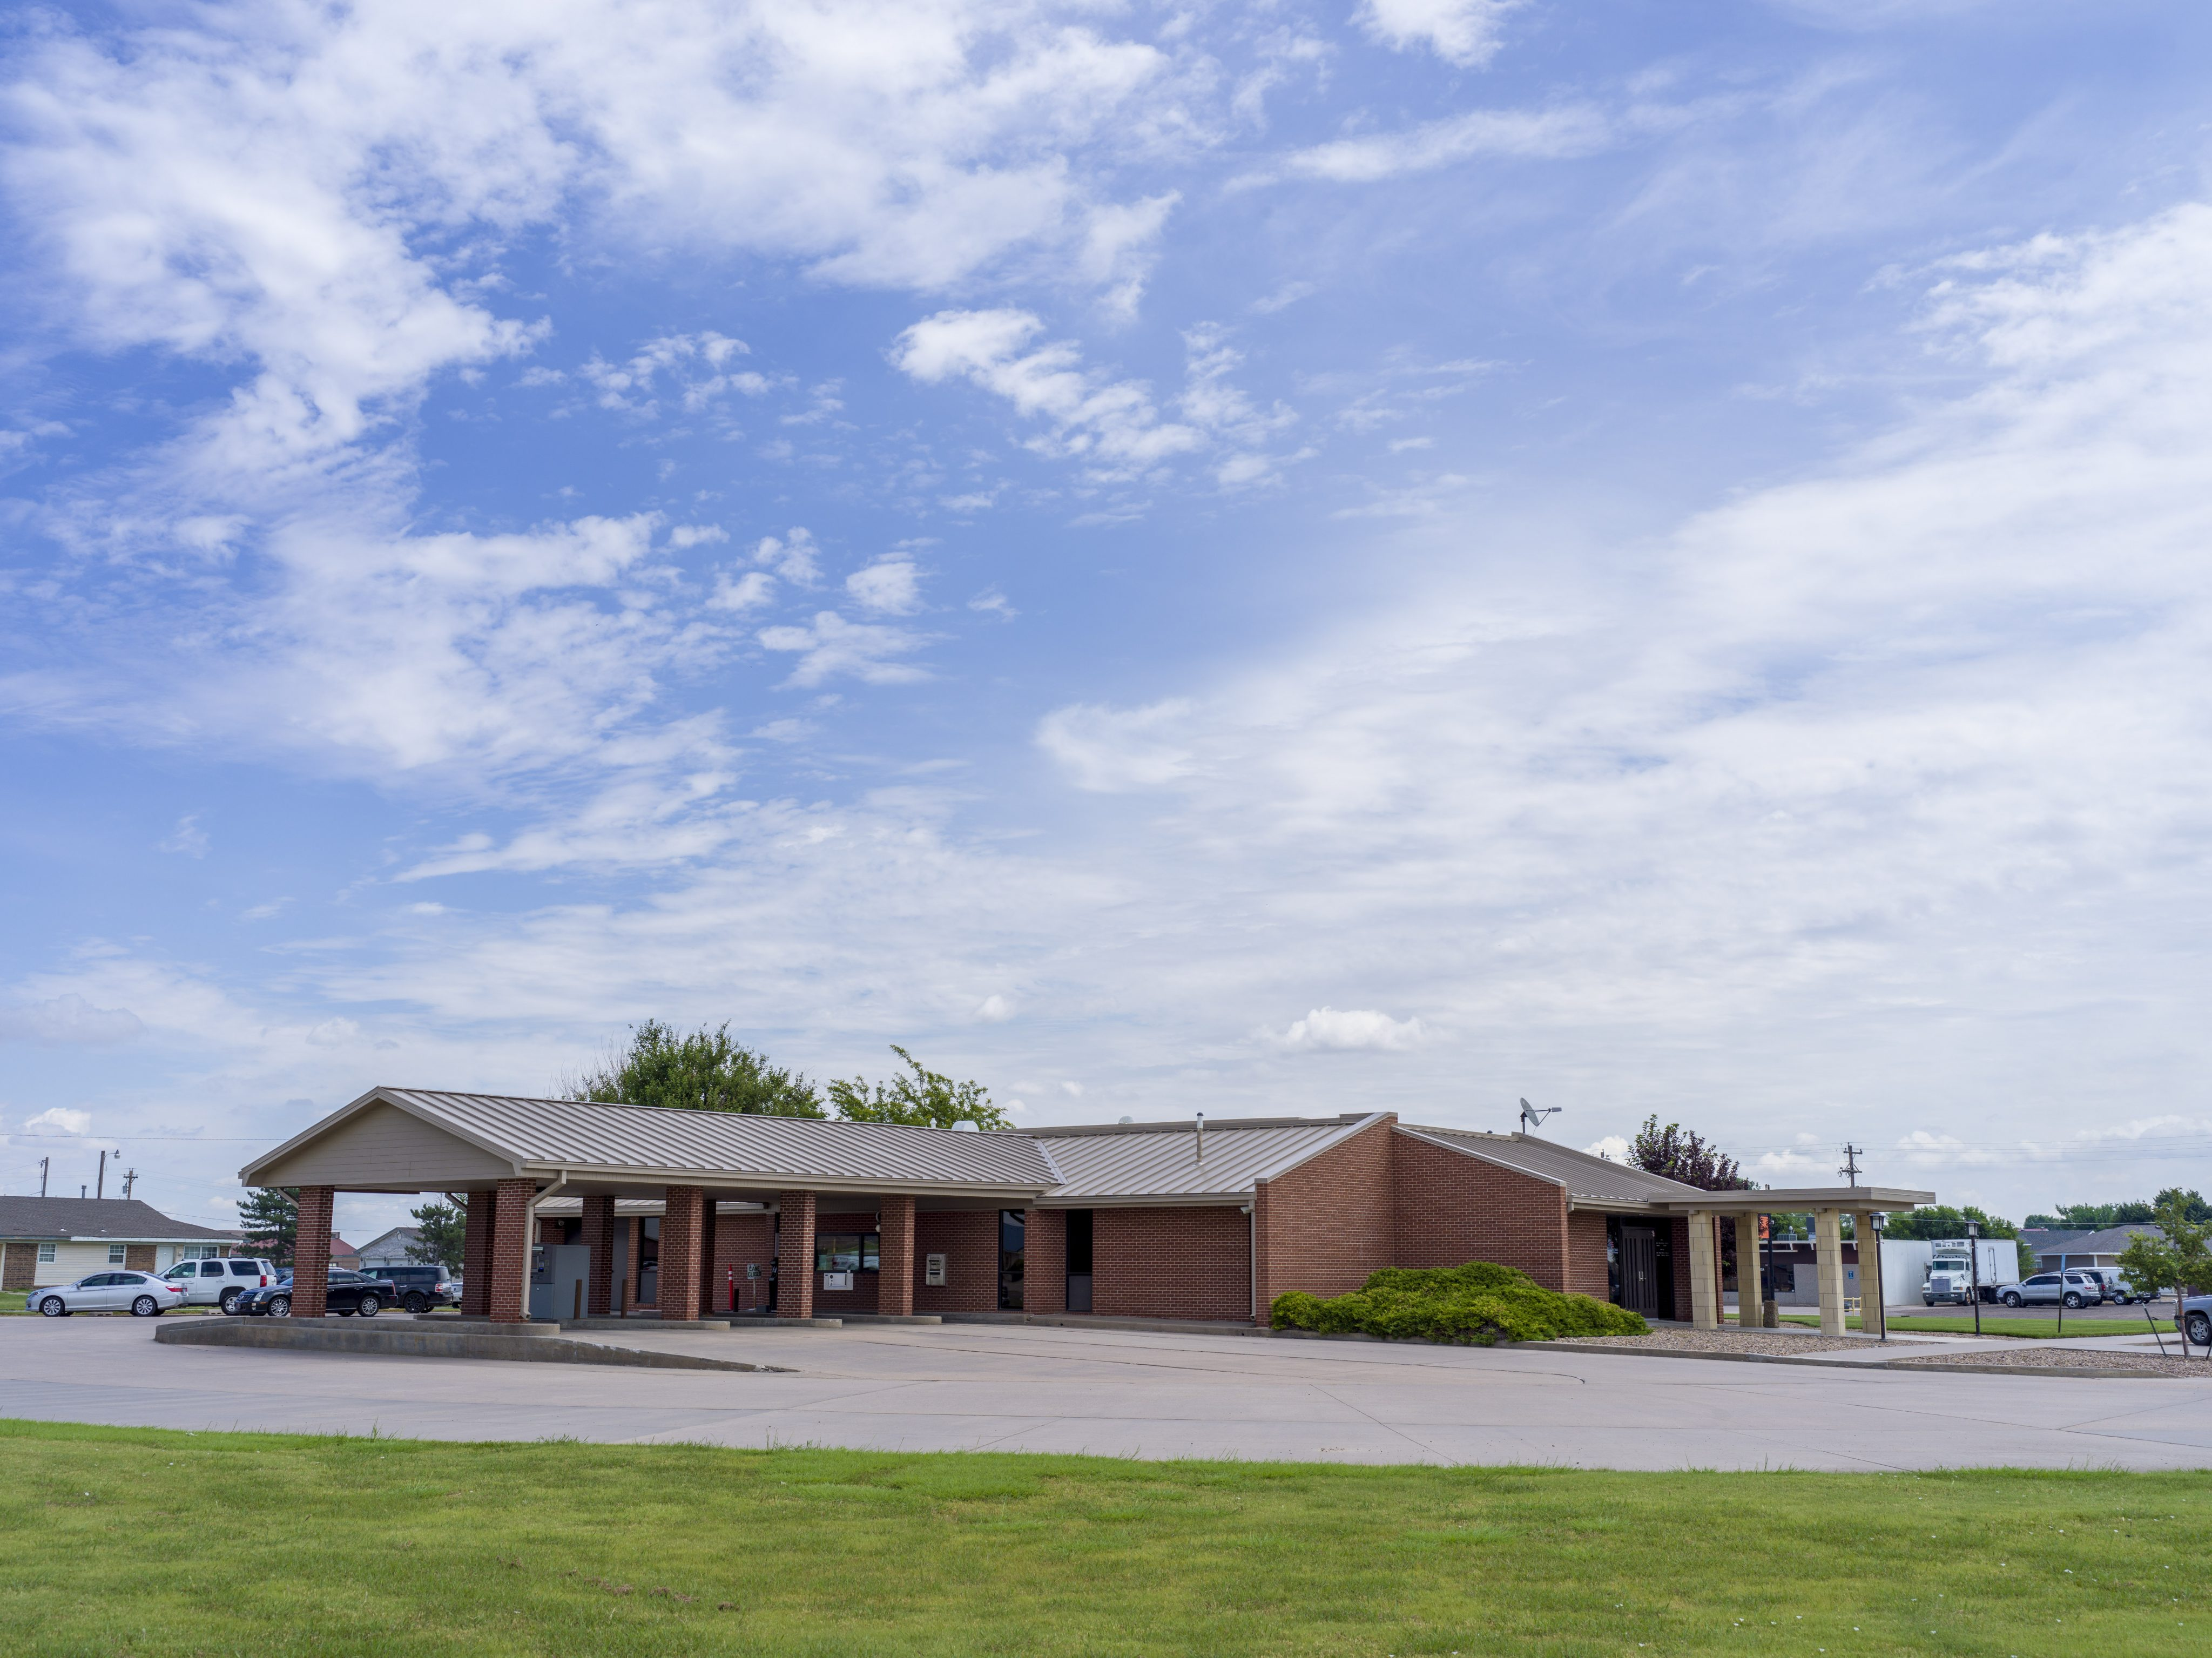 Equity Bank Holcomb Kansas